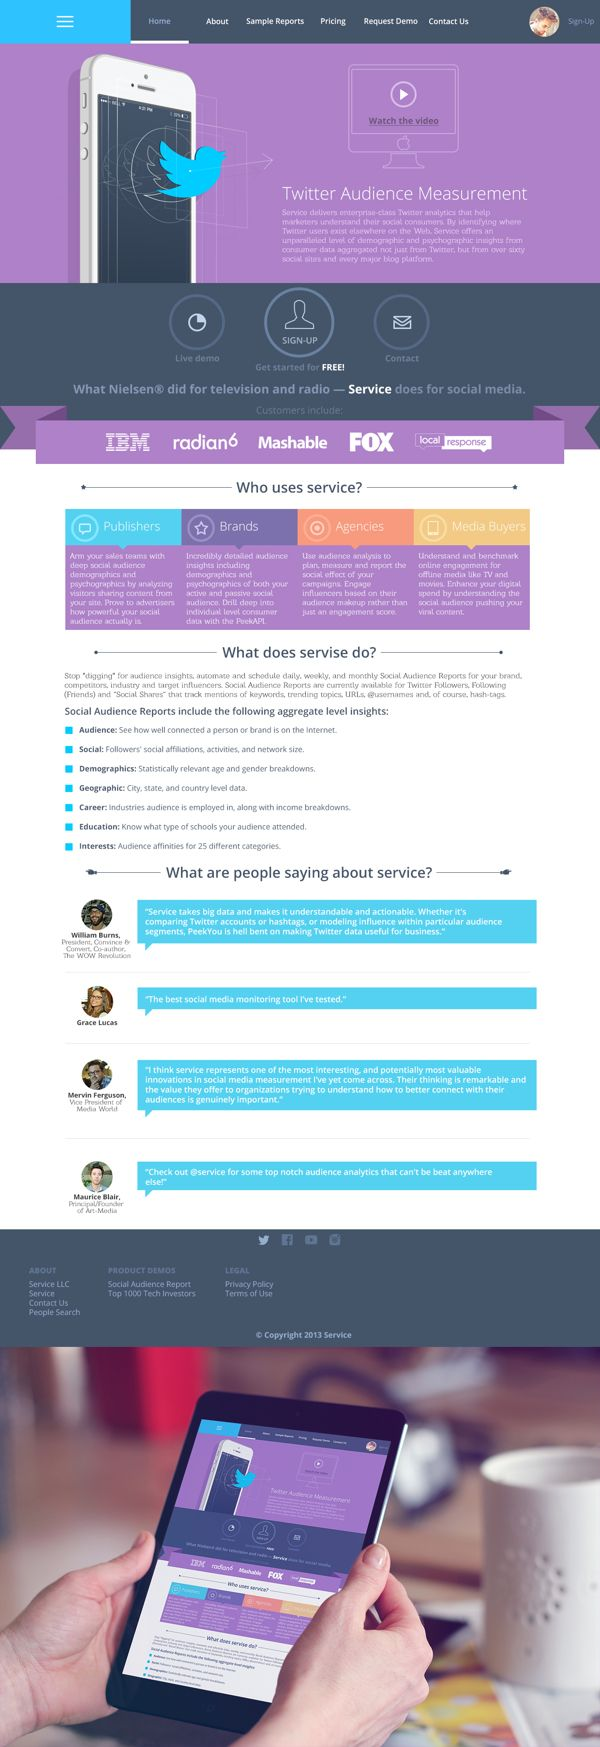 Service Home Page by Sergey Valiukh, via Behance